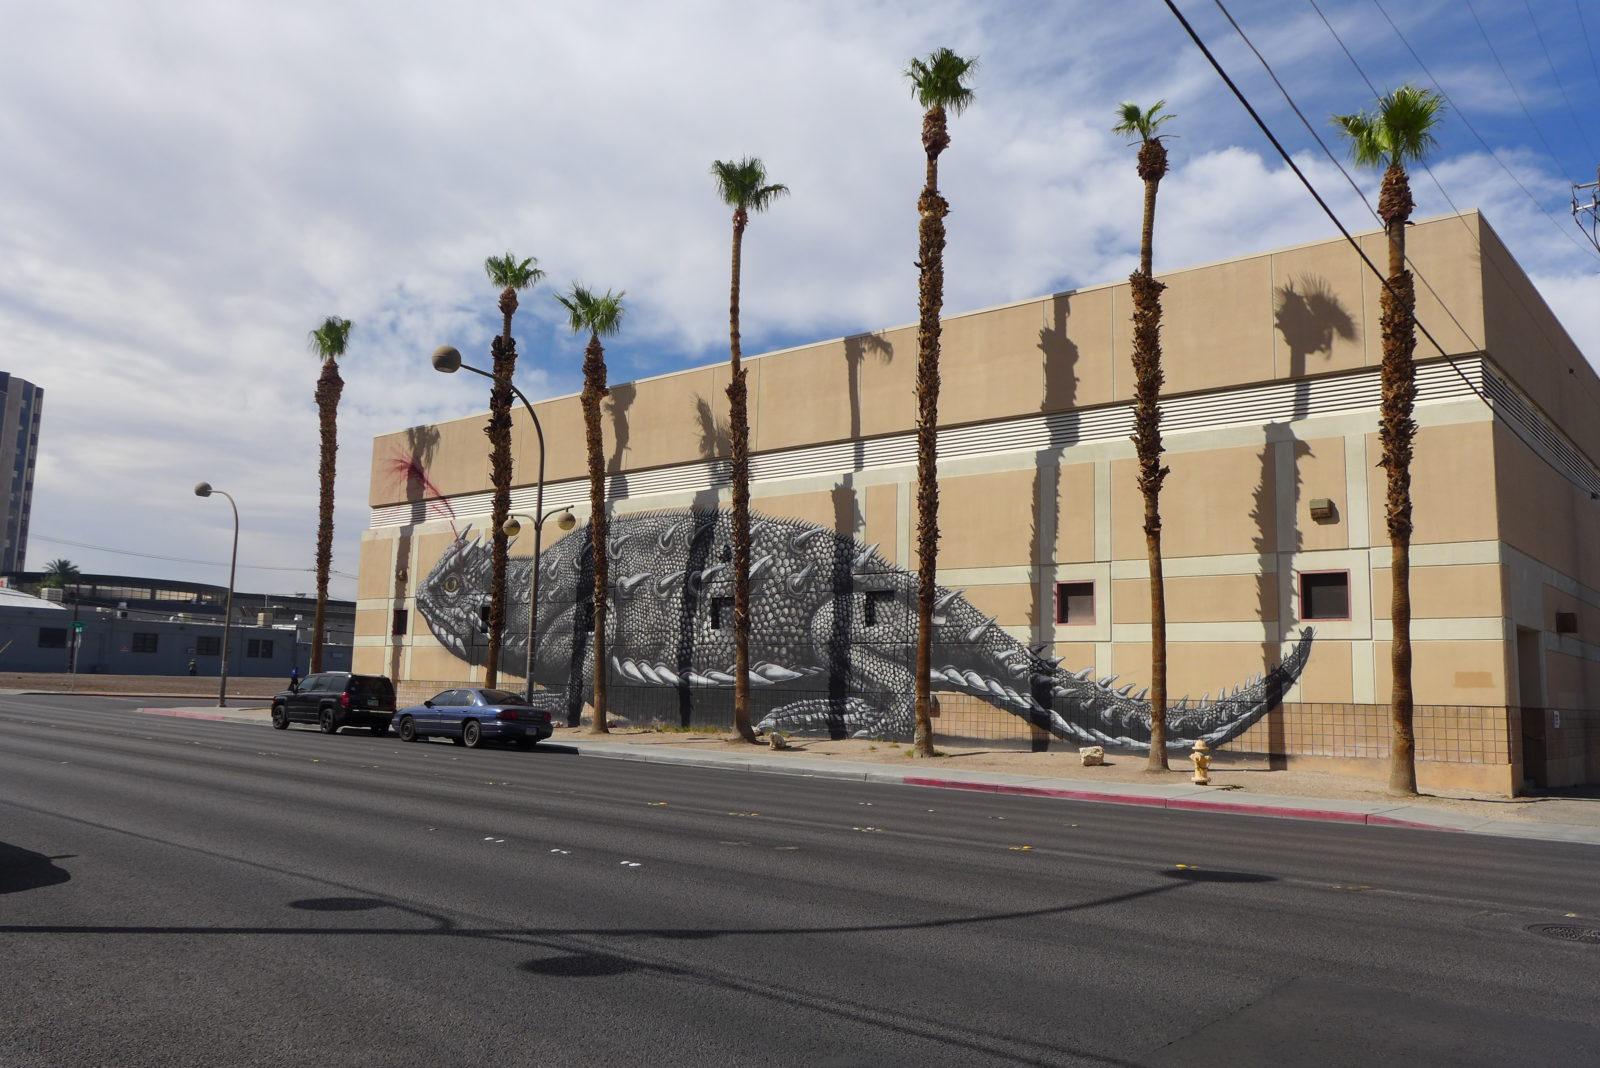 arturbain lasvegas street art murals radar graffitiROA - À Las Vegas, un festival de street art et musique revitalise un quartier en perdition